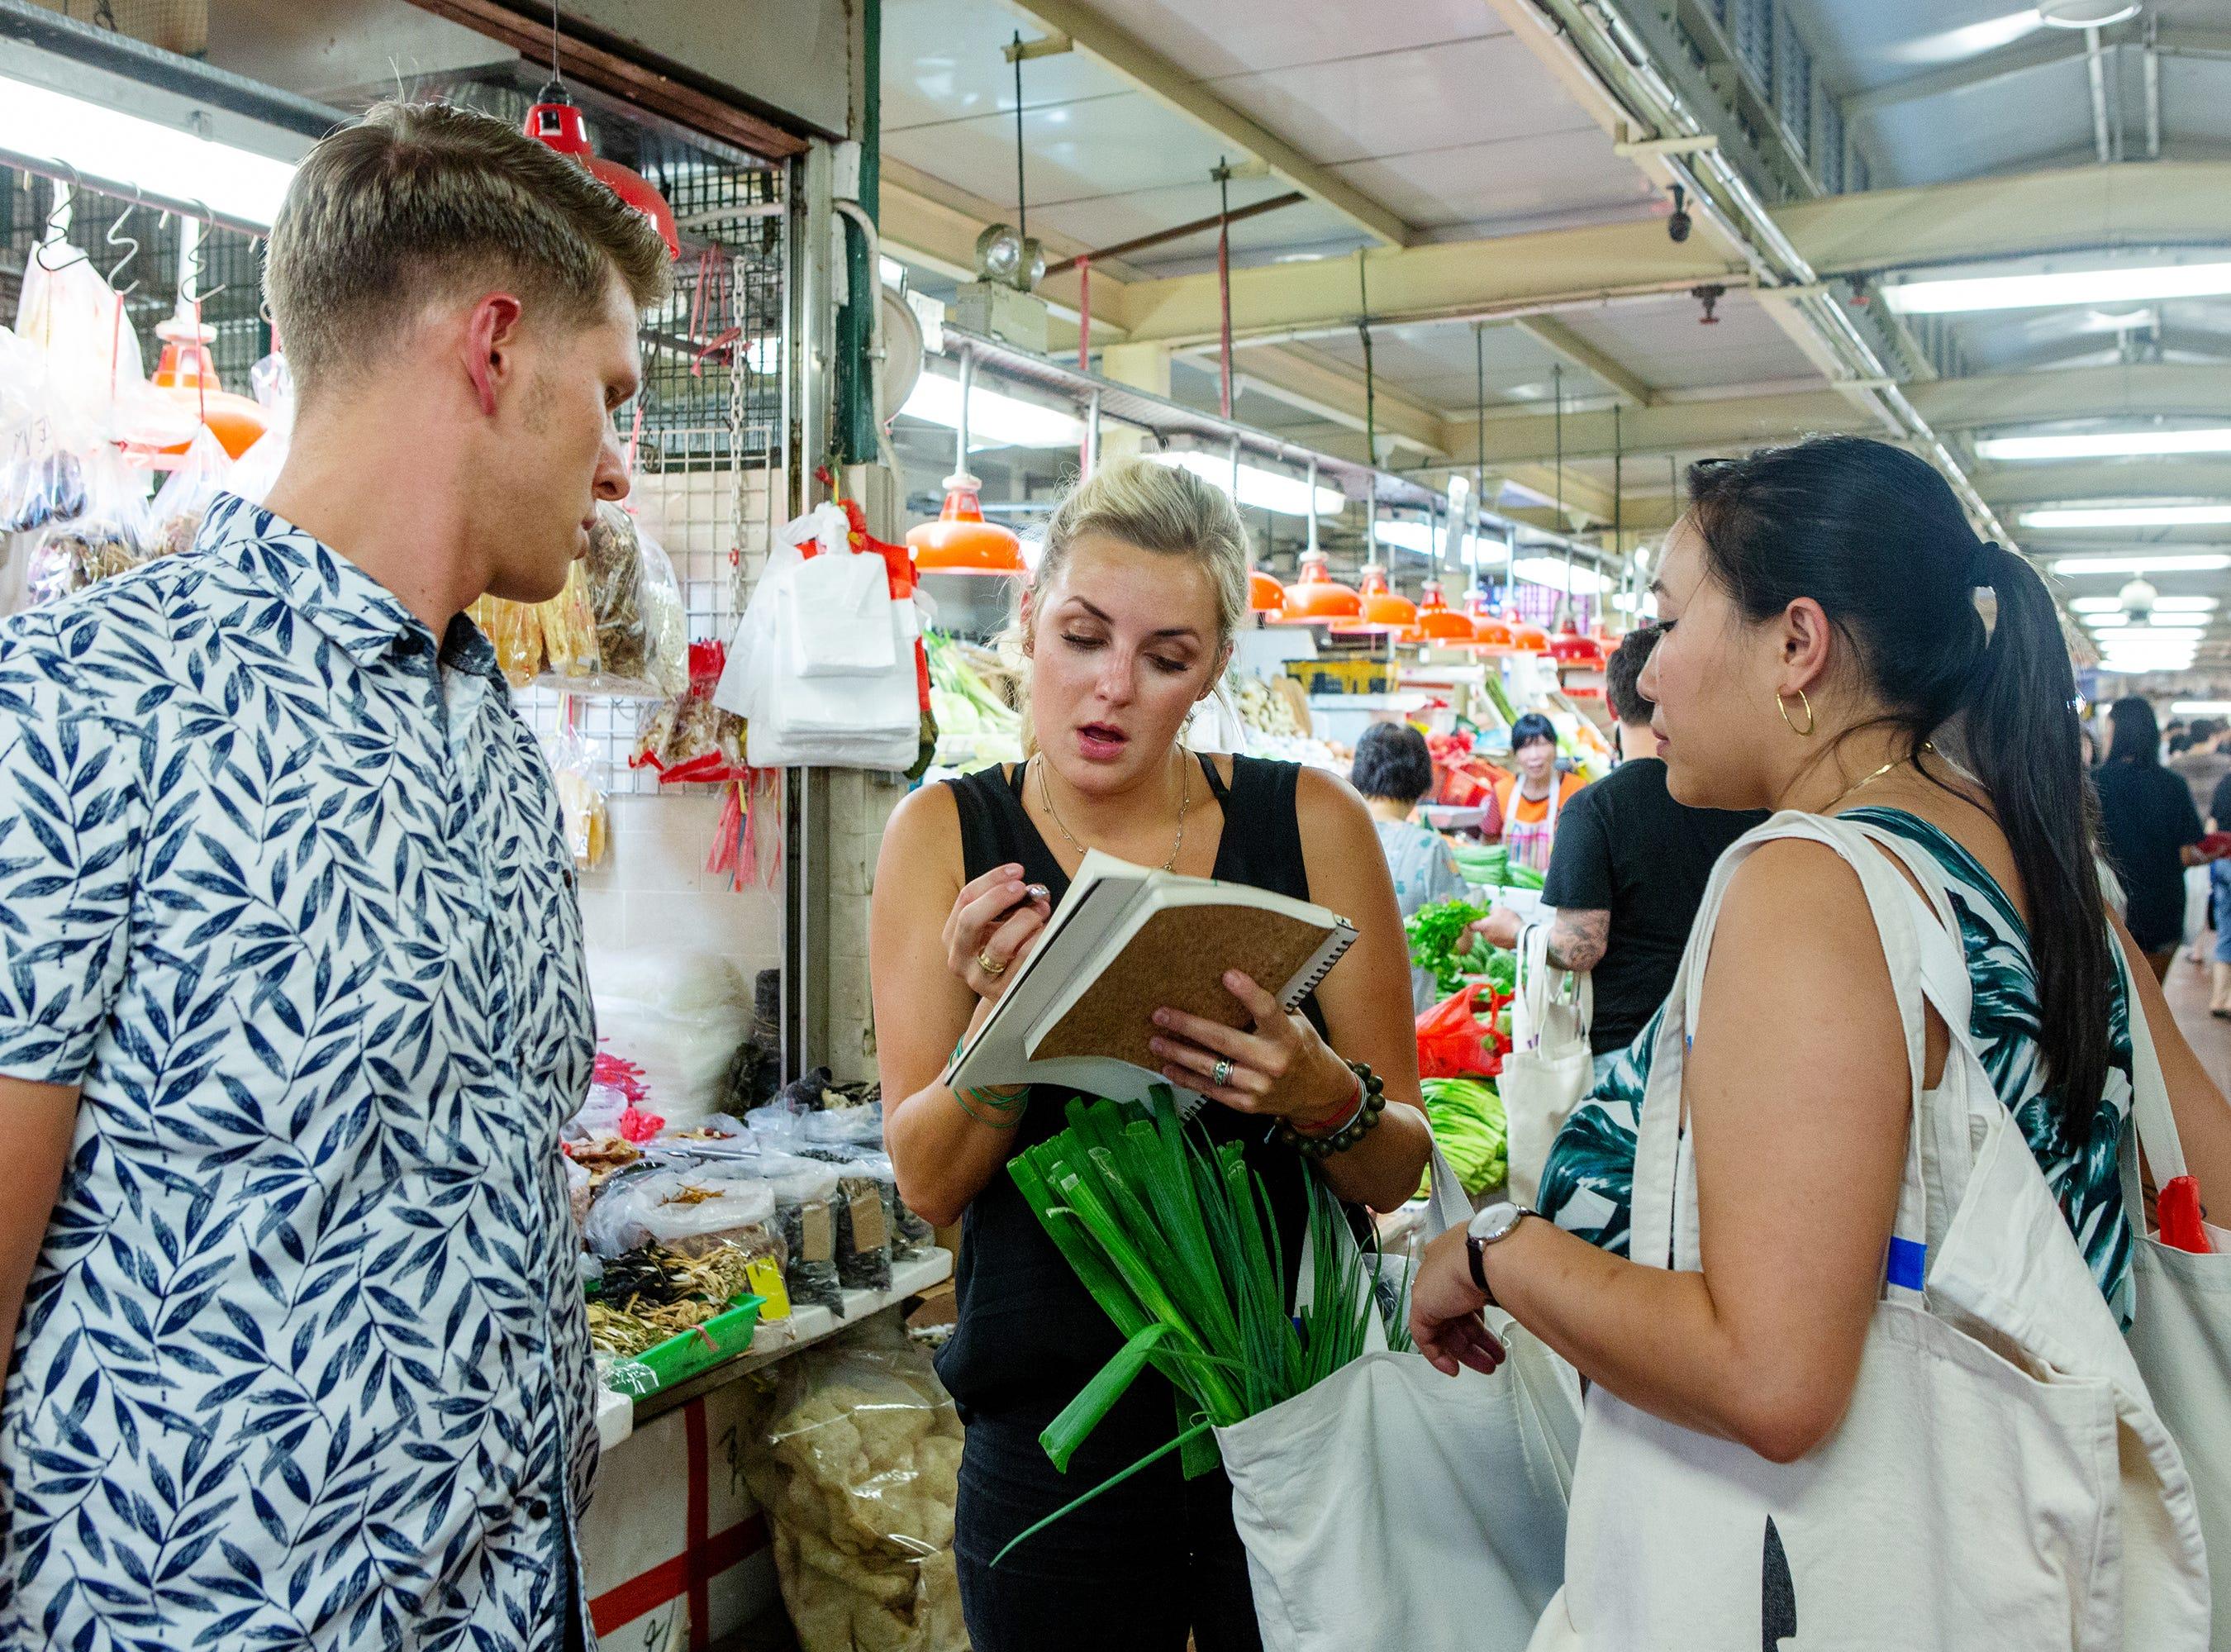 Finalist Kelsey Barnard Clark (center) shops for ingredients with former contestants Brandon Rosen and Nini Nguyen on episode 15 of 'Top Chef' Kentucky.